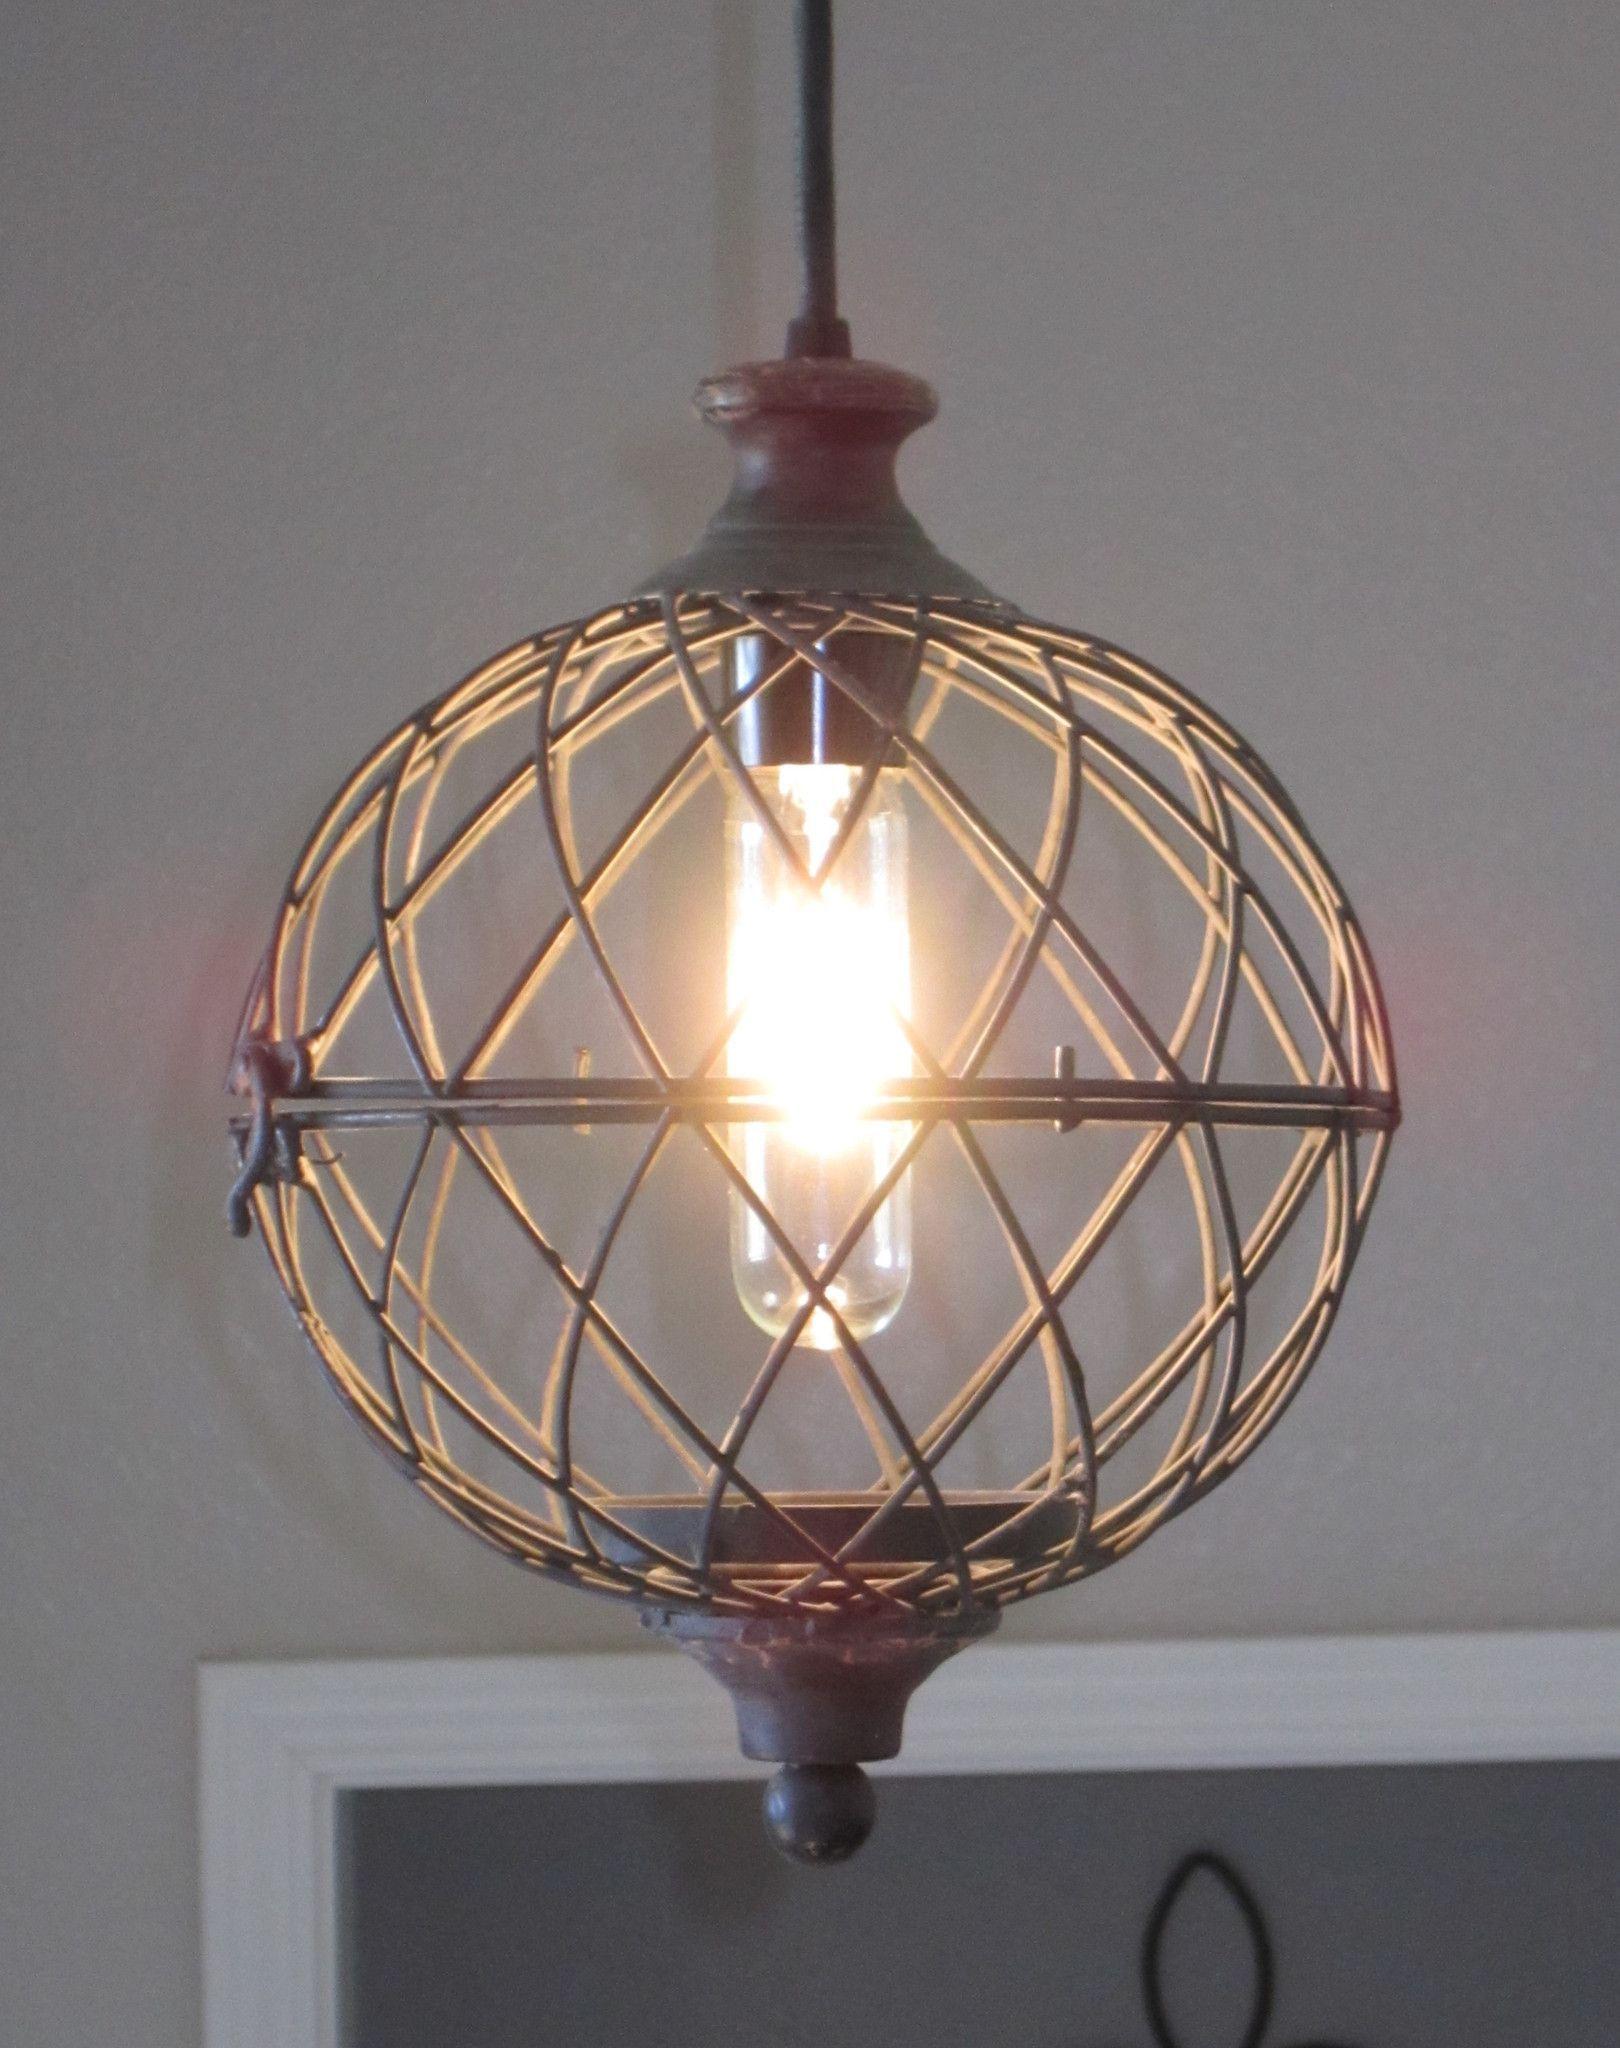 Rustic metal globe pendant light distressed rustic lighting